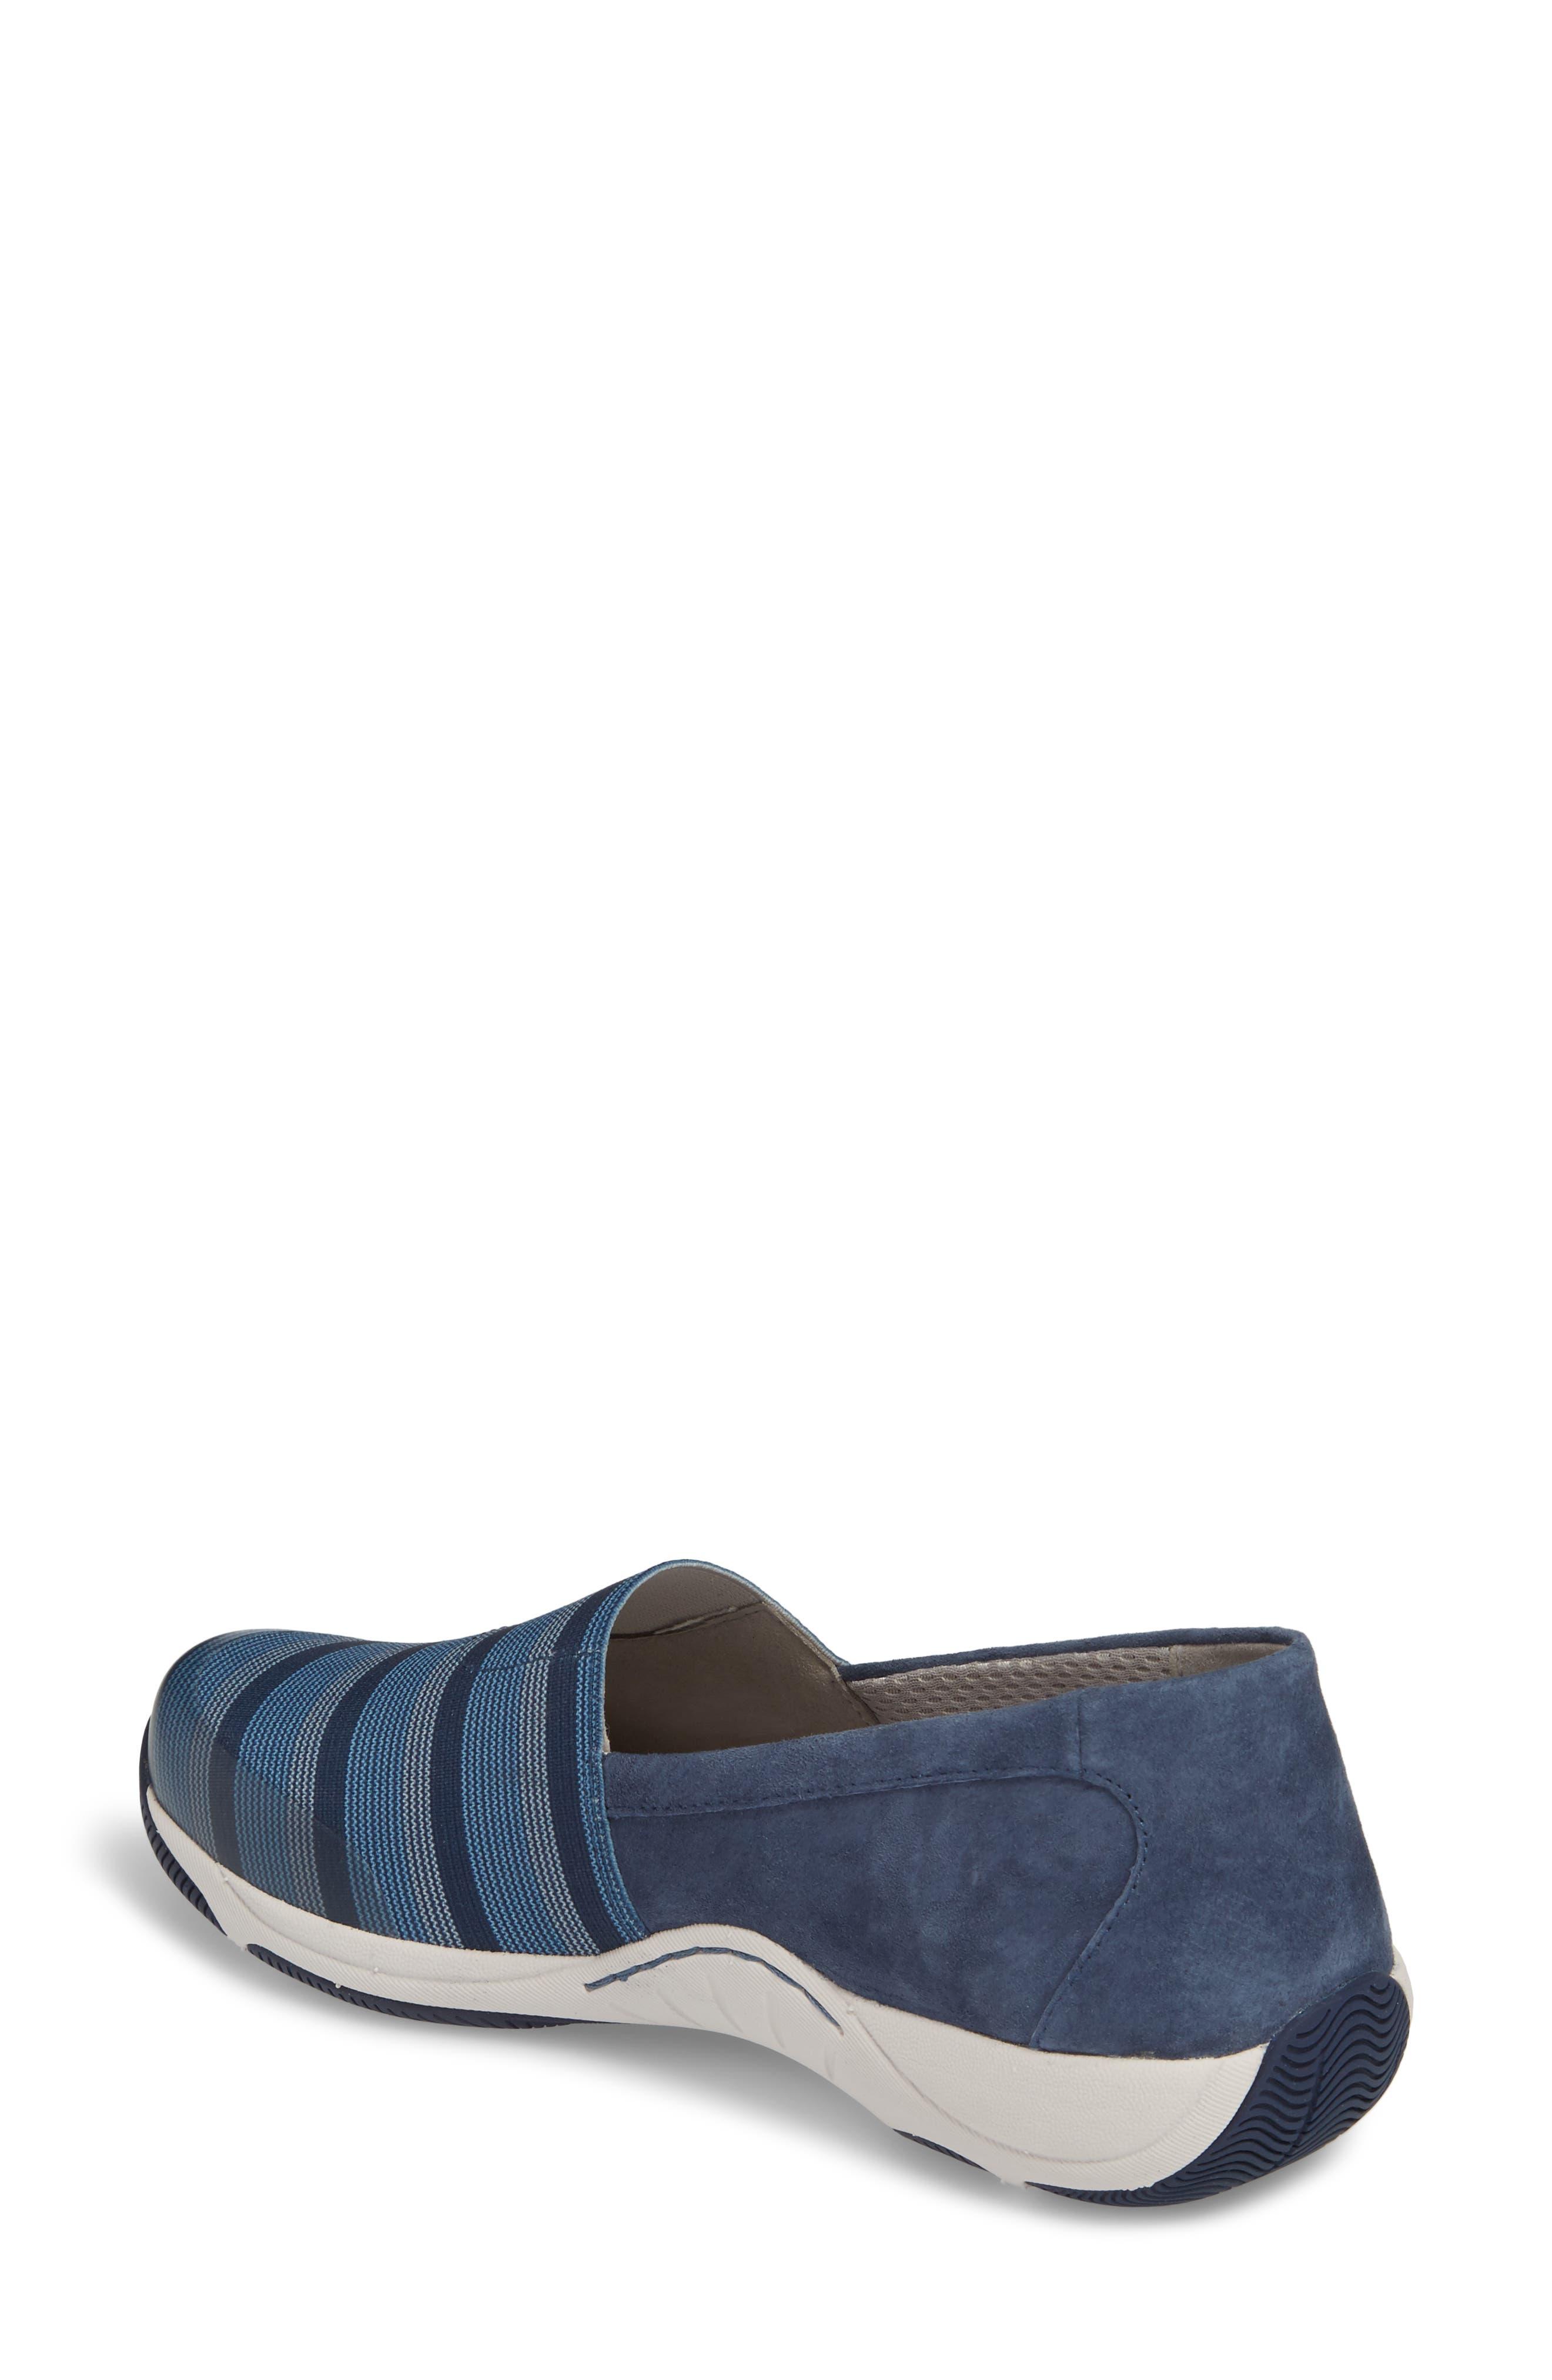 Harriet Slip-On Sneaker,                             Alternate thumbnail 2, color,                             Blue Suede